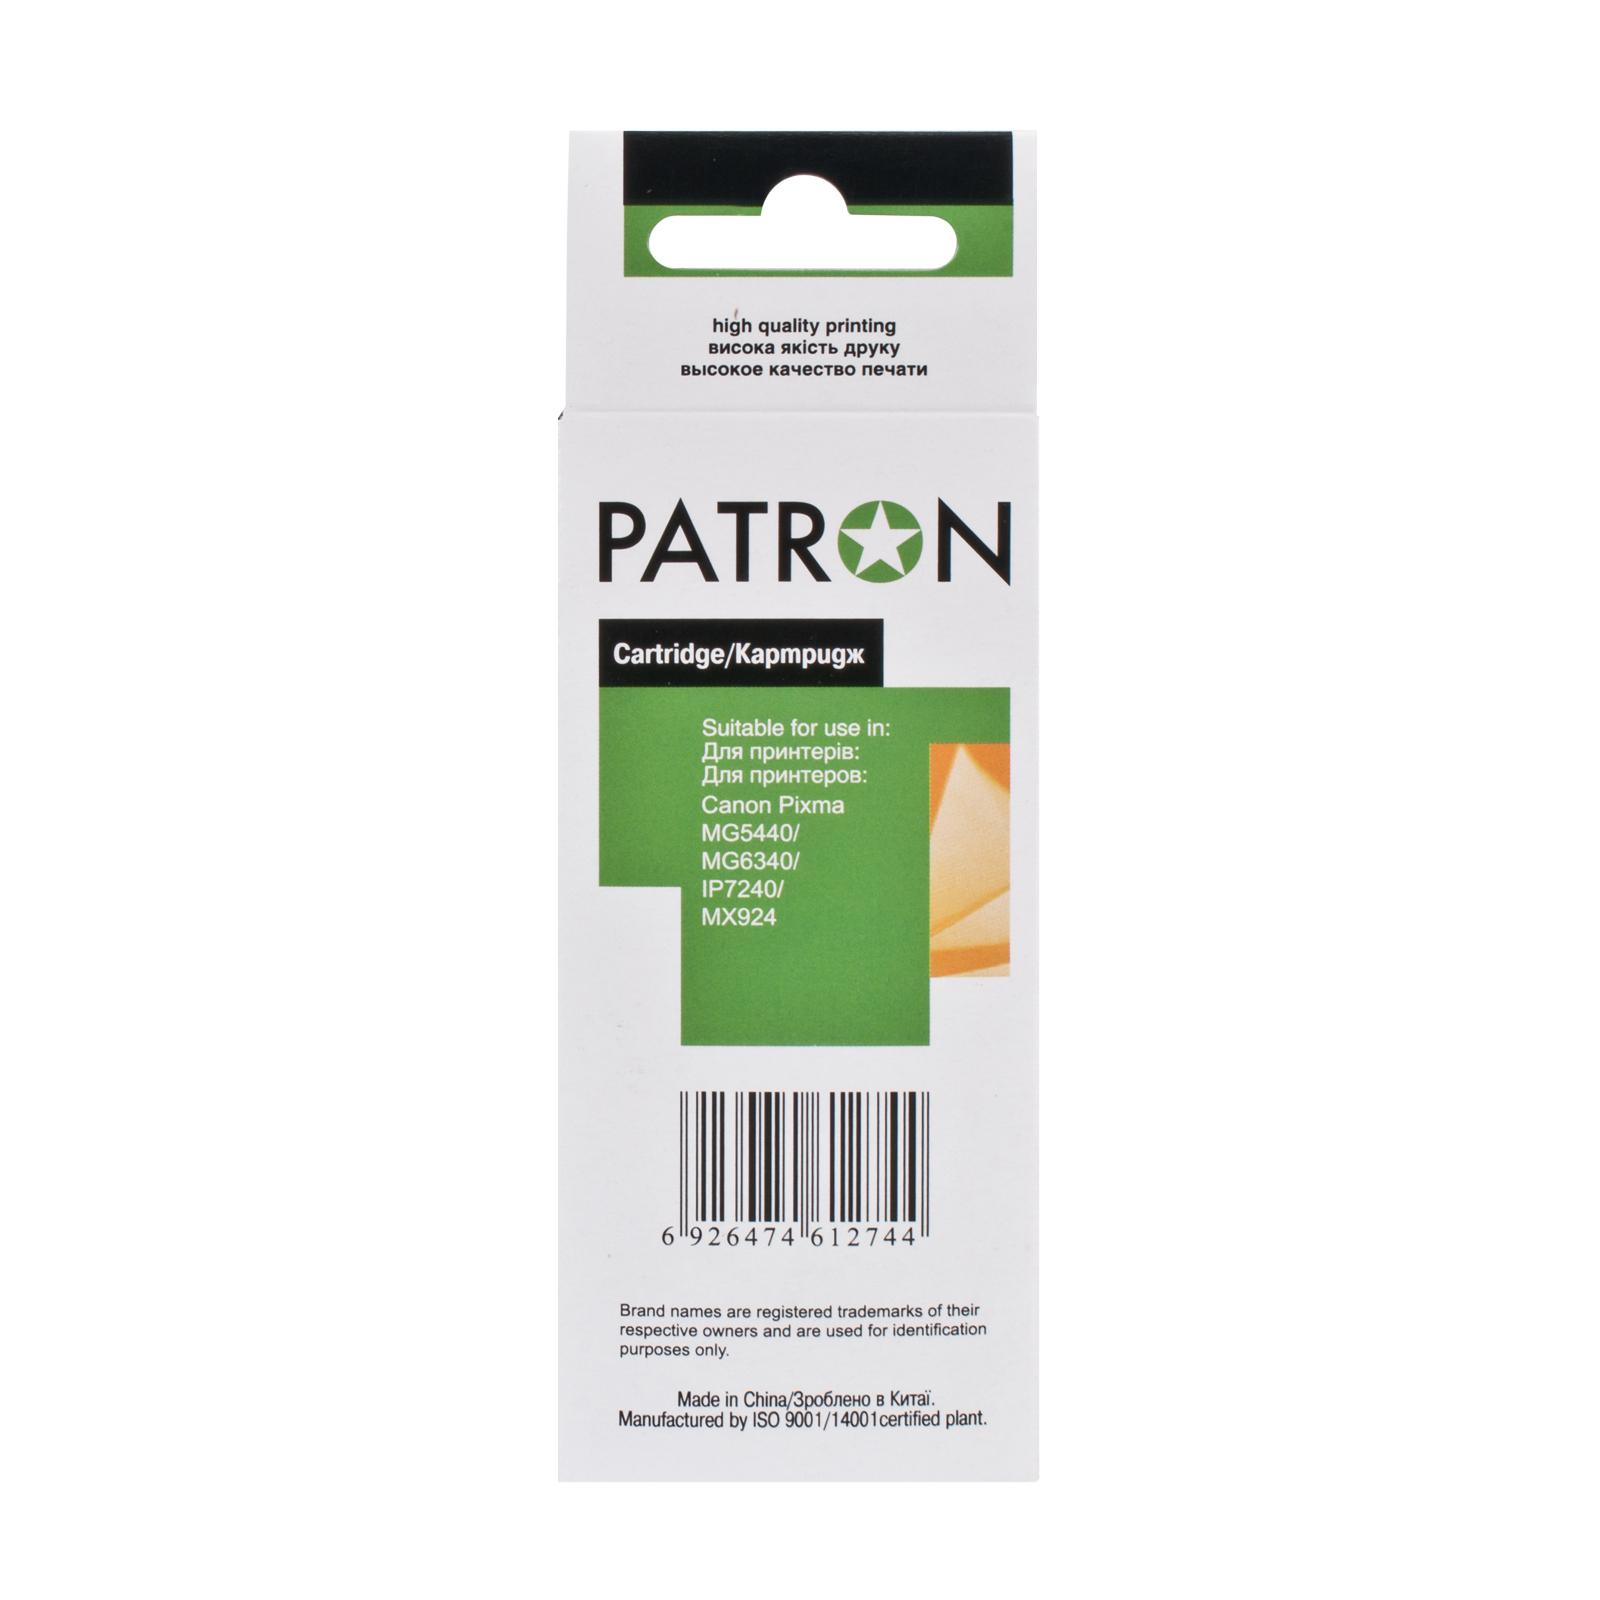 Картридж PATRON CANON PGI-450XLBk (PN-450XLBK) BLACK (CI-CAN-PGI-450-B-PN) изображение 4